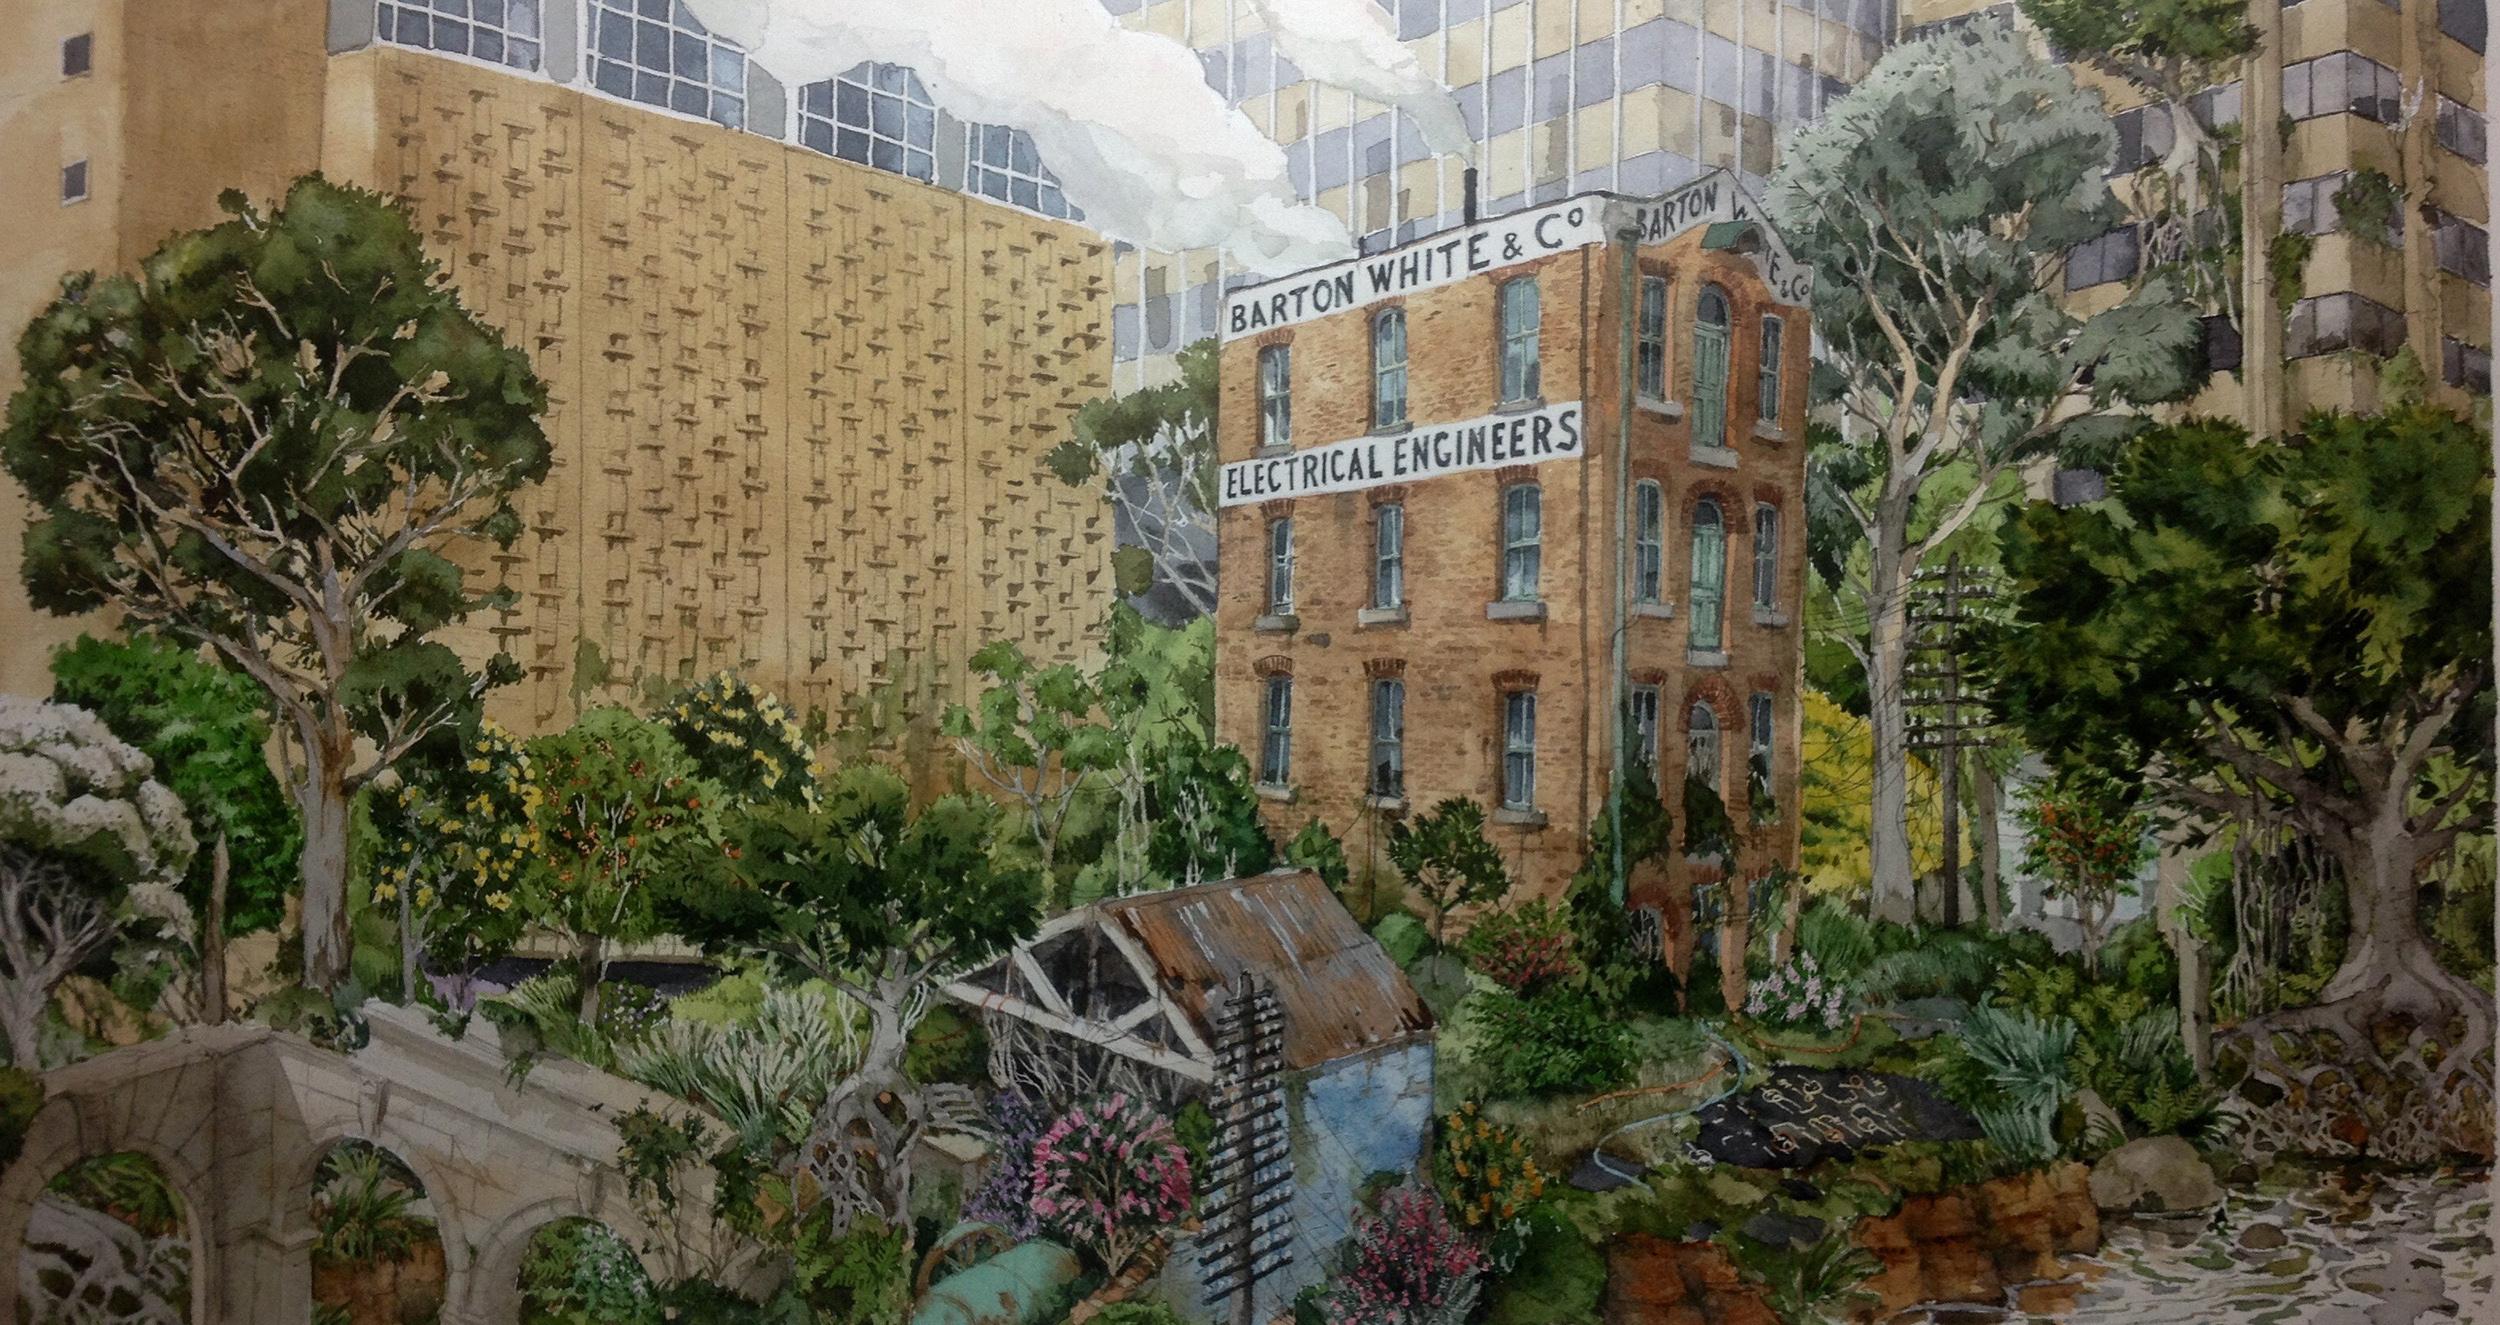 Simon MacEwan, Transformer,  2015, Watercolour on paper, 45 x 24.5cm